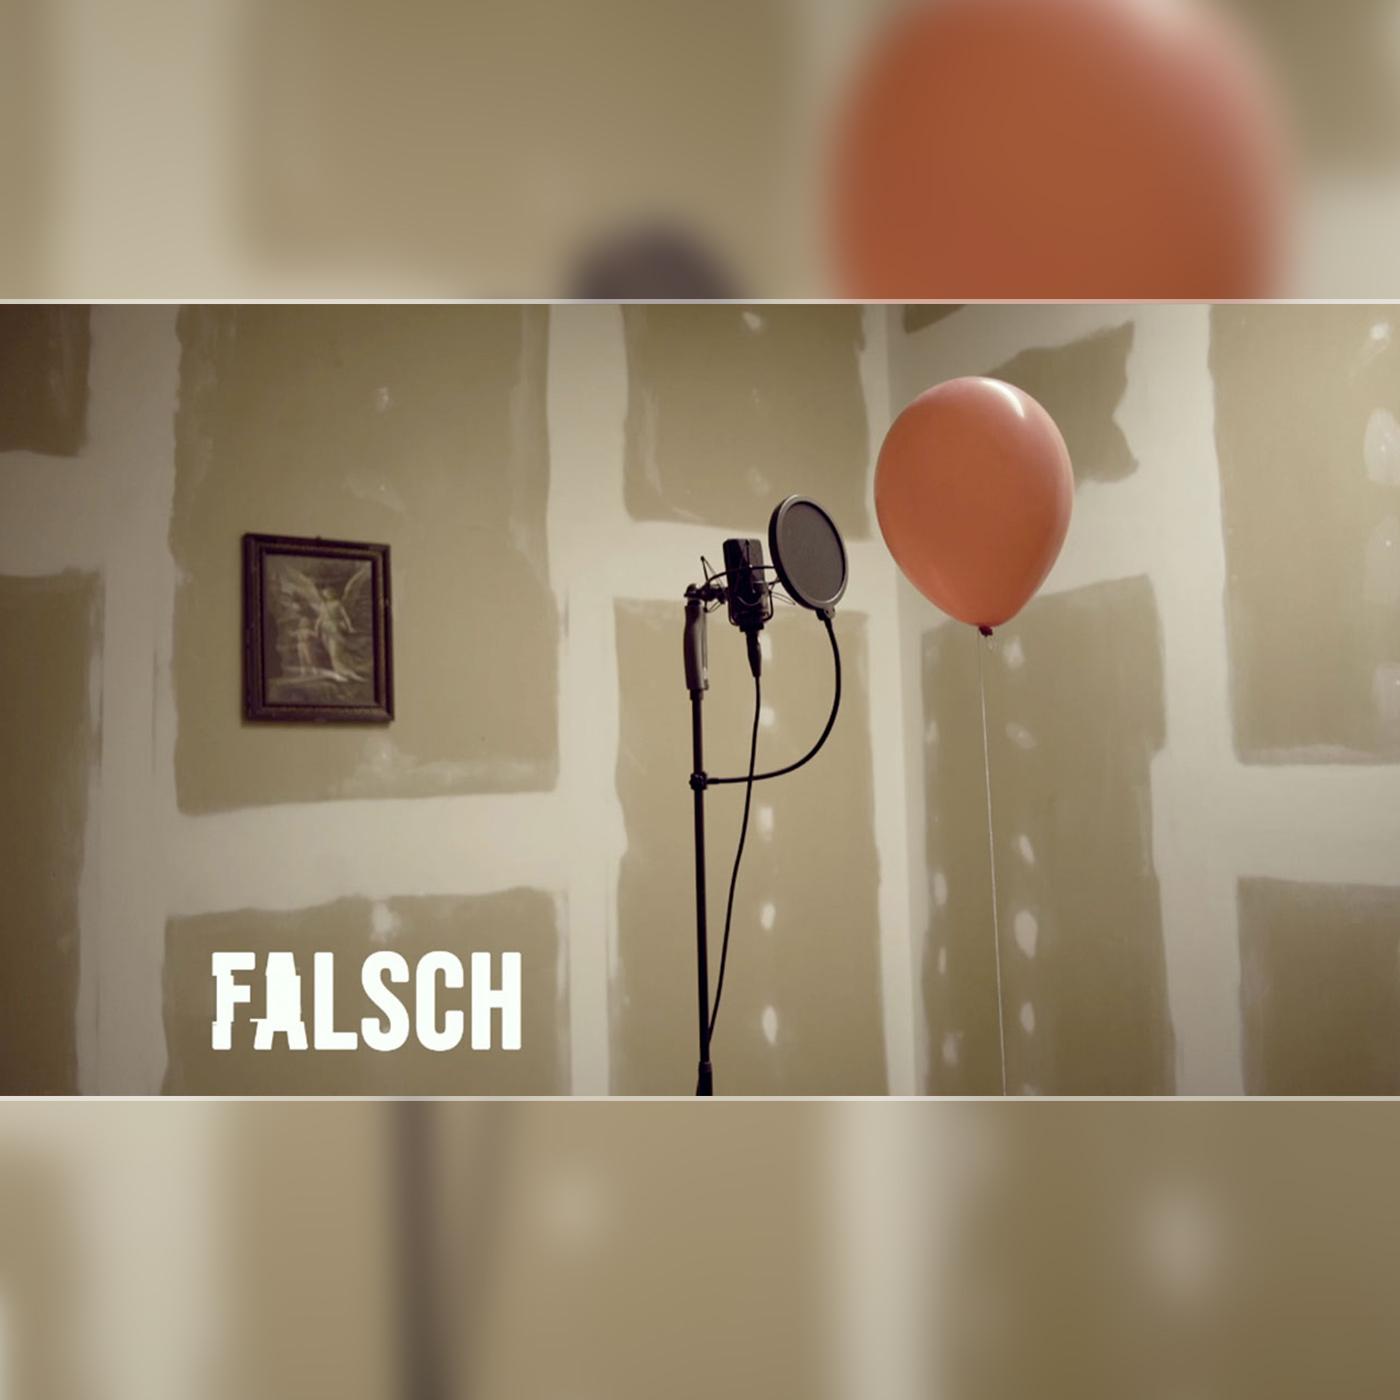 Upcoming: Bisi - Falsch (Official Video) [prod. NZ6]